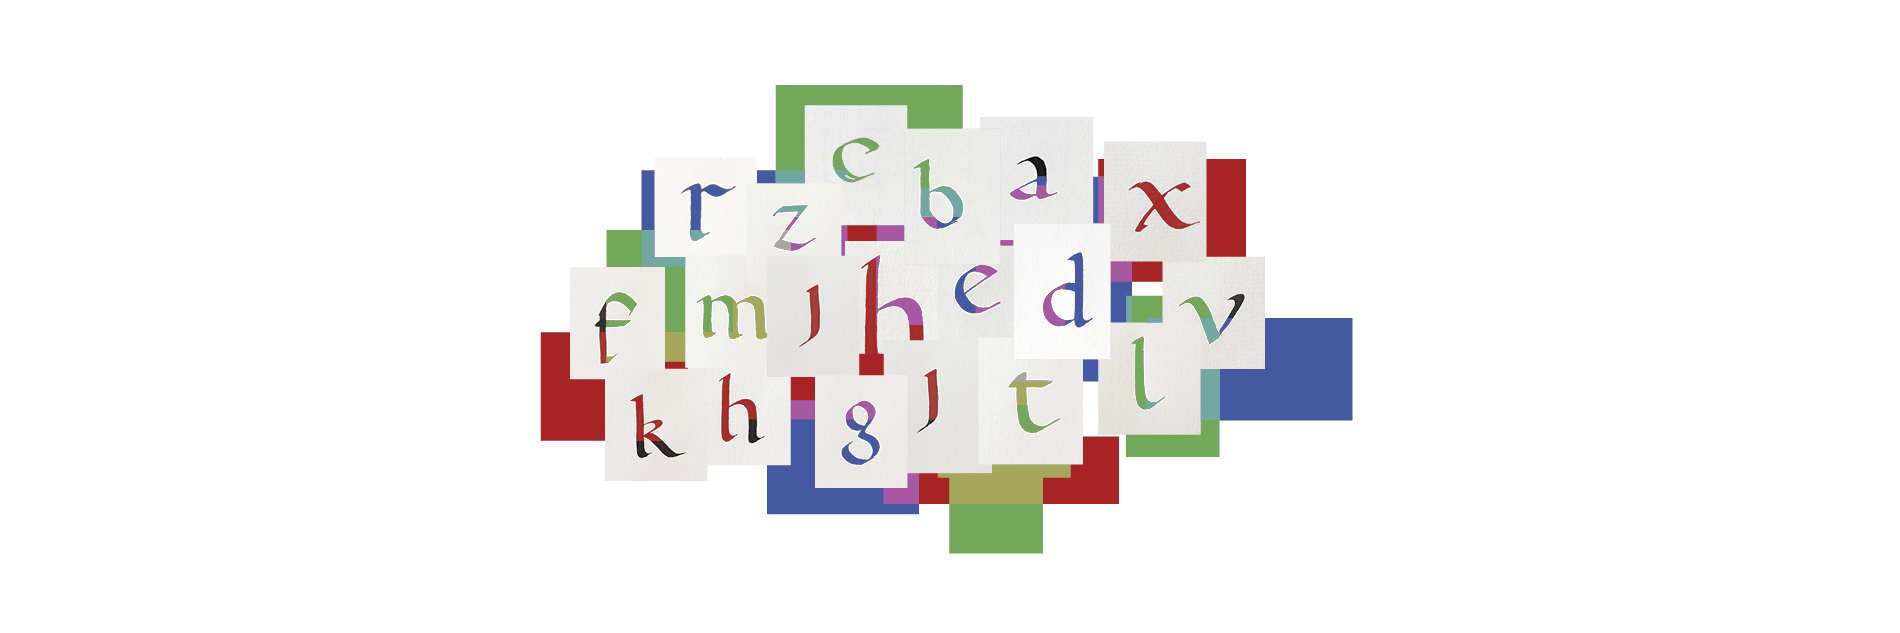 13-alfabeto